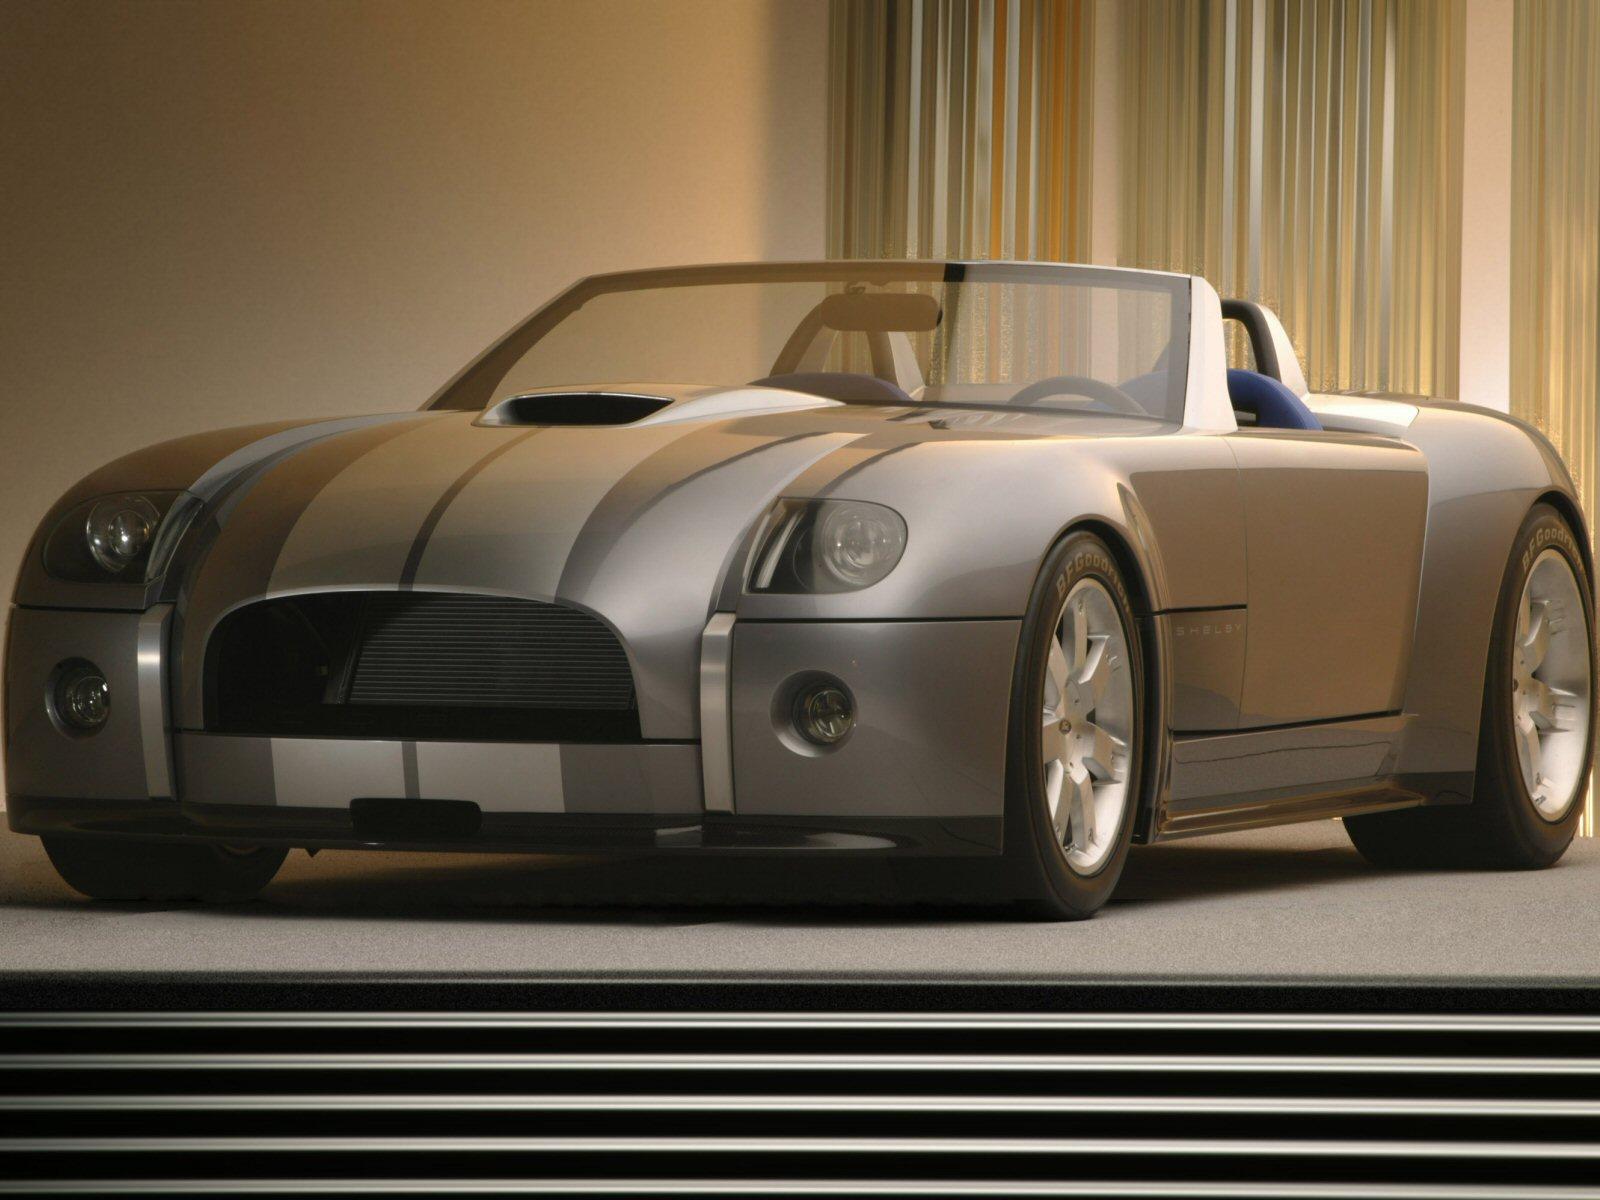 Ford Shelby Cobra Concept on 4 6 Liter Cobra Engine